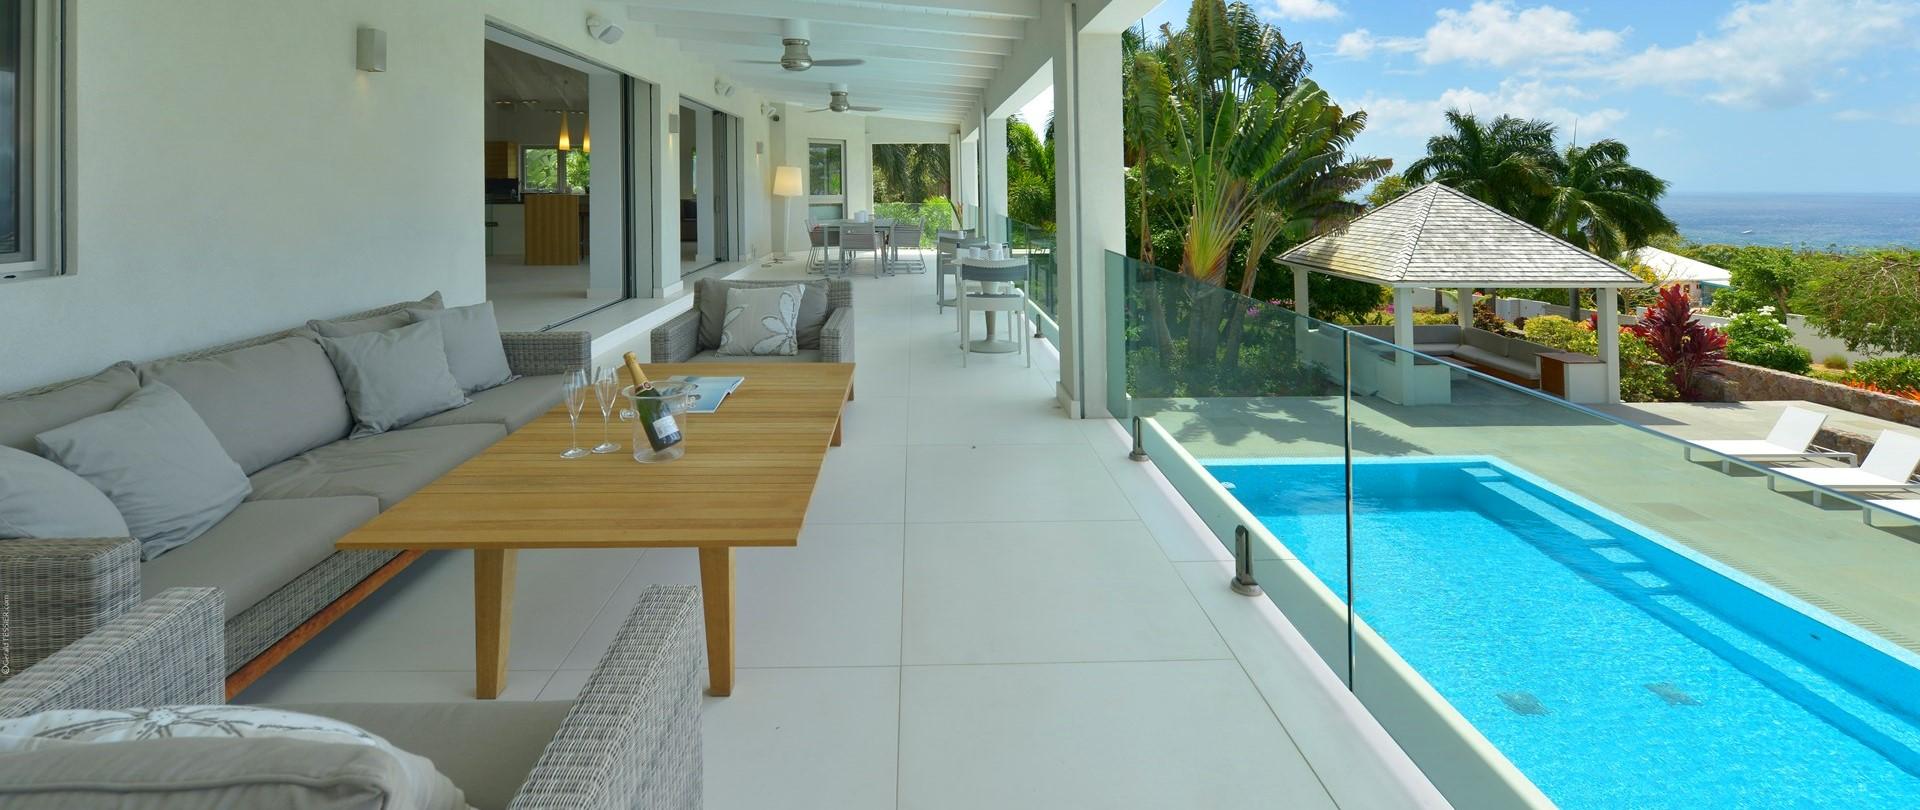 luxury-3-bed-modern-villa-nevis